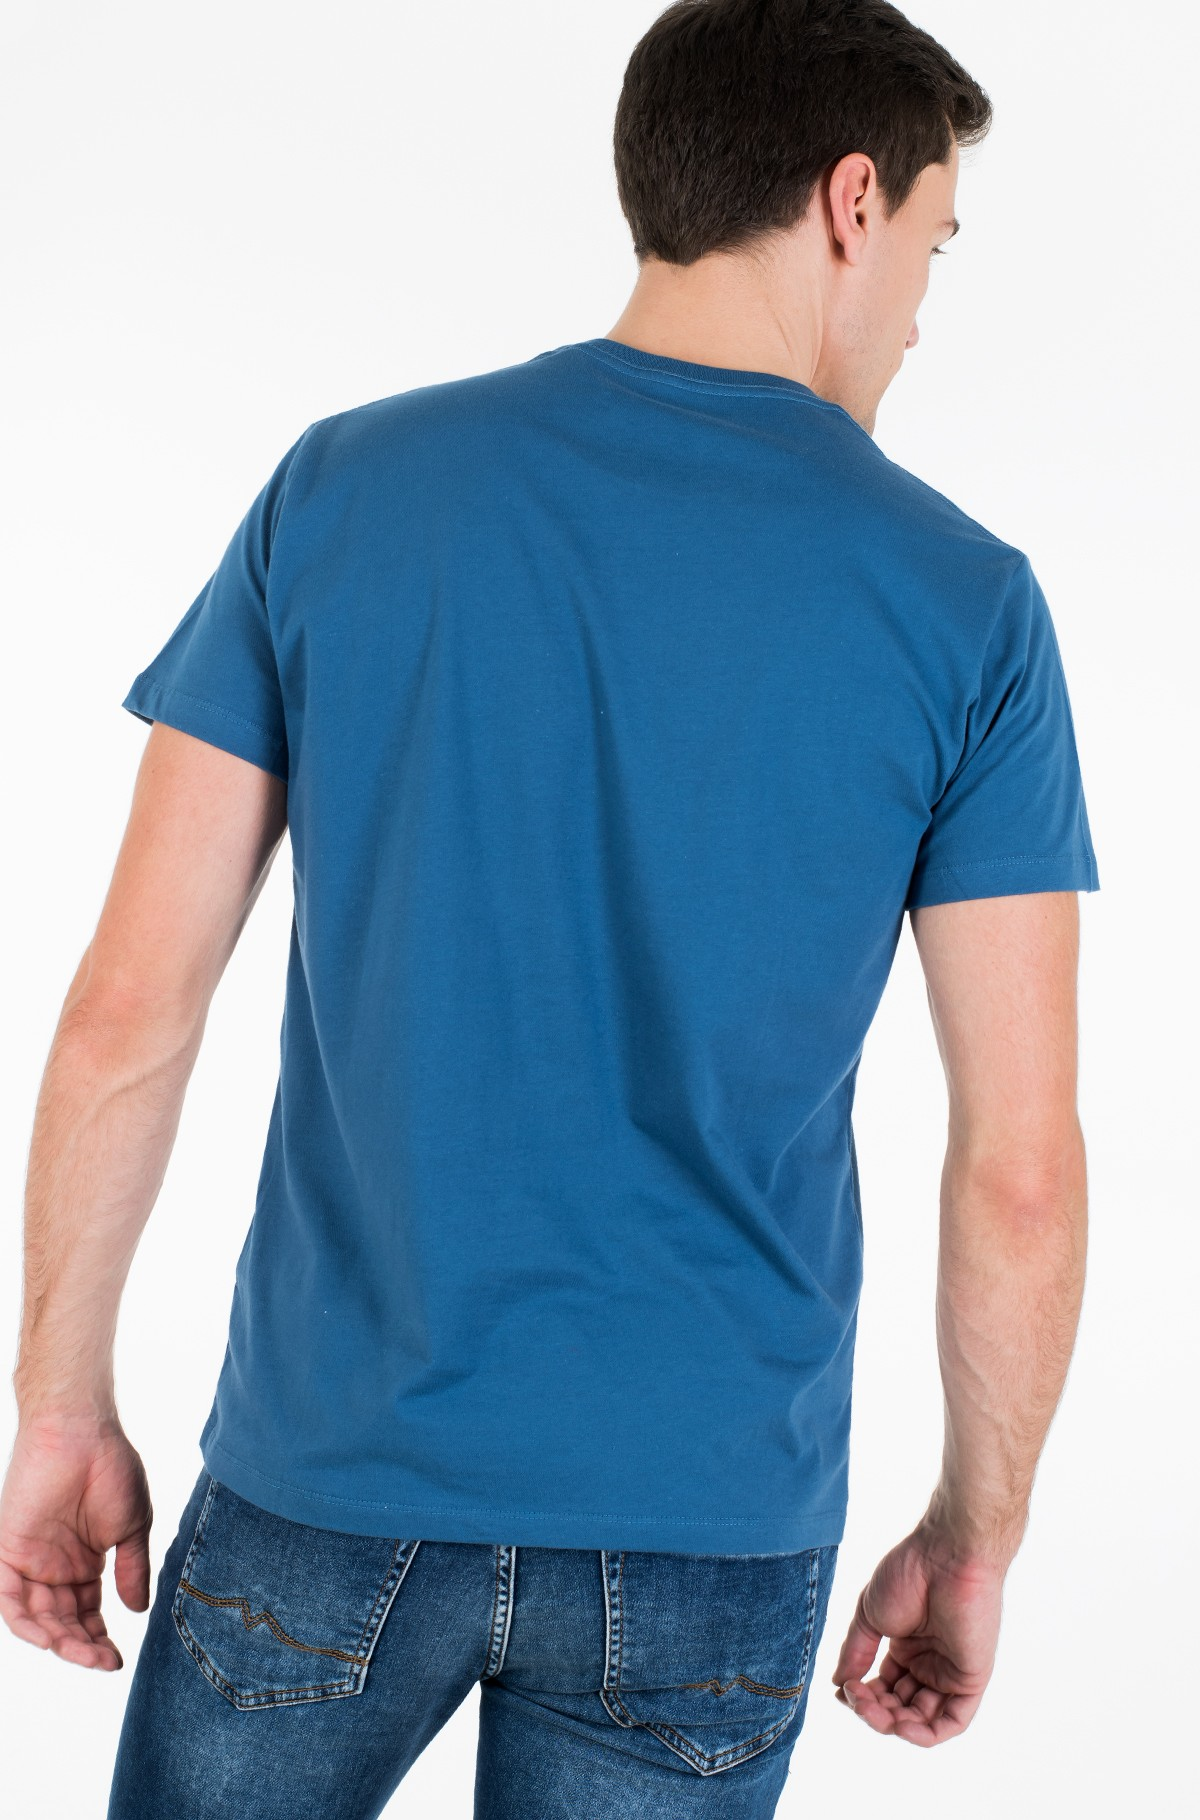 Marškinėliai Eggo-full-2